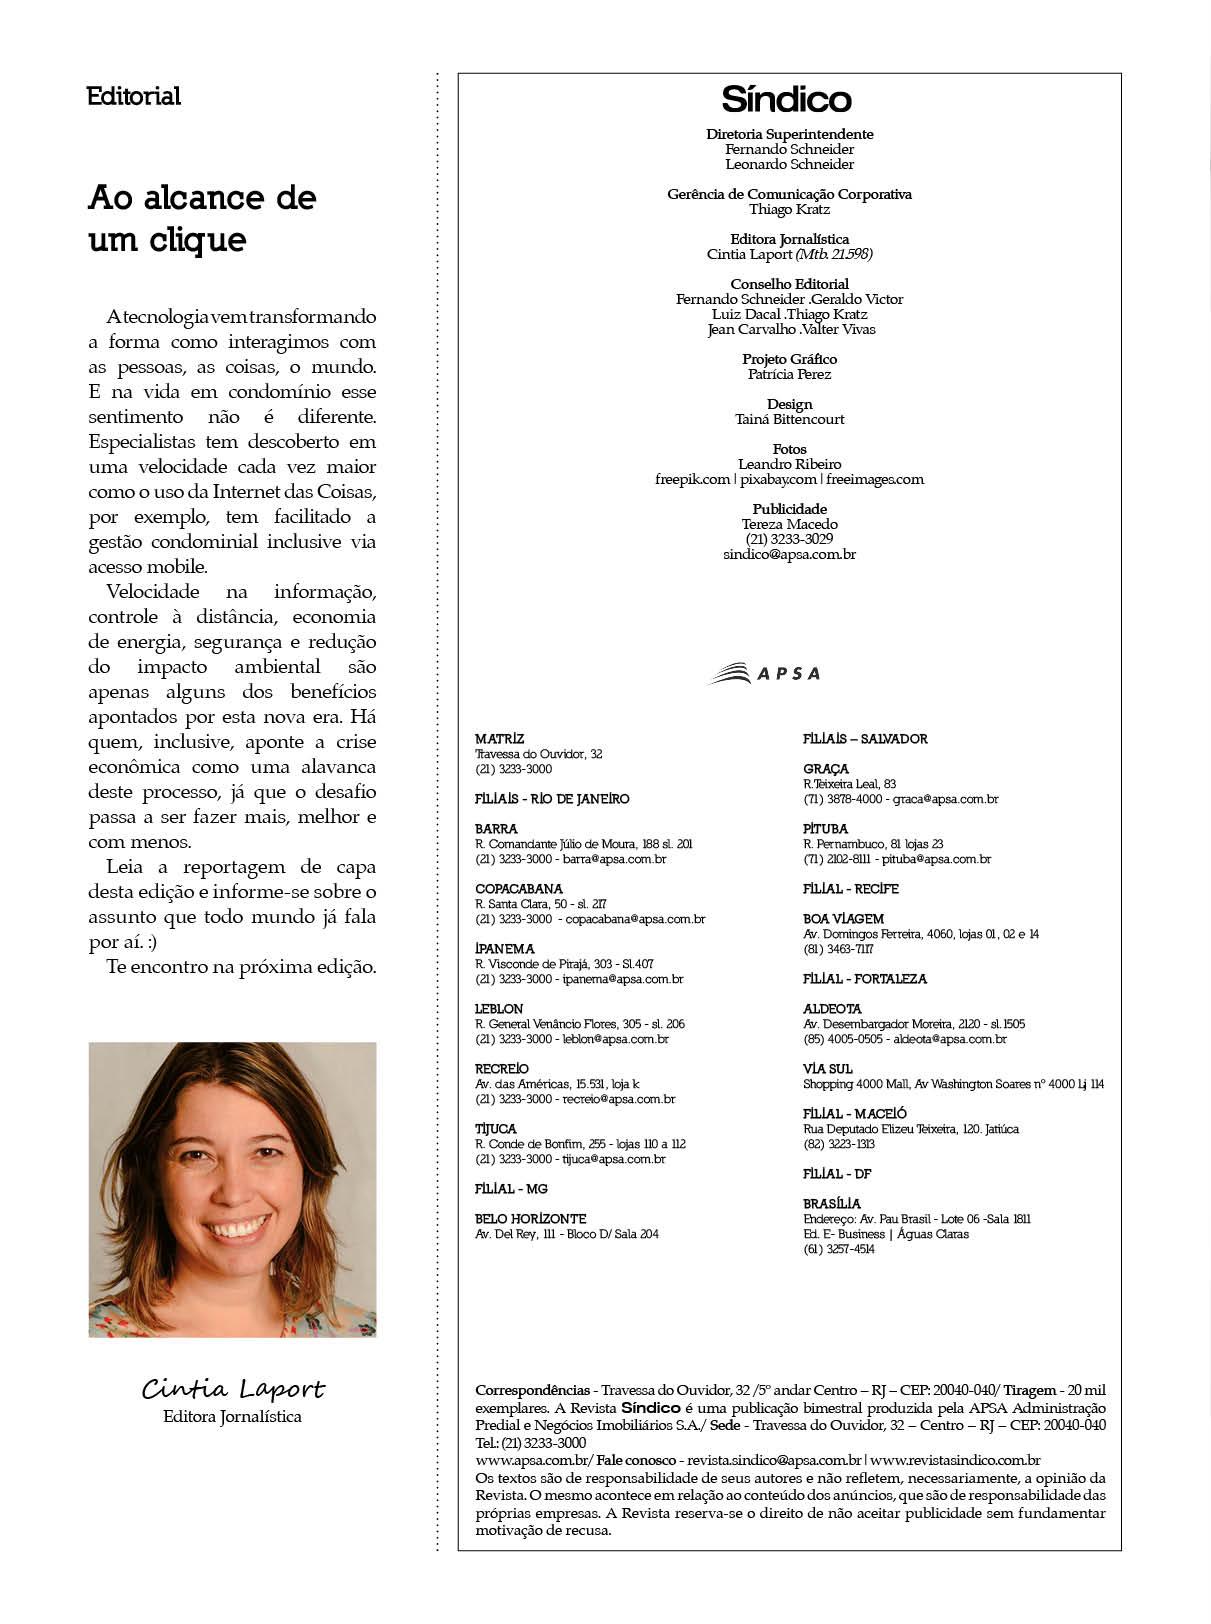 Revista Síndico_ed 2452